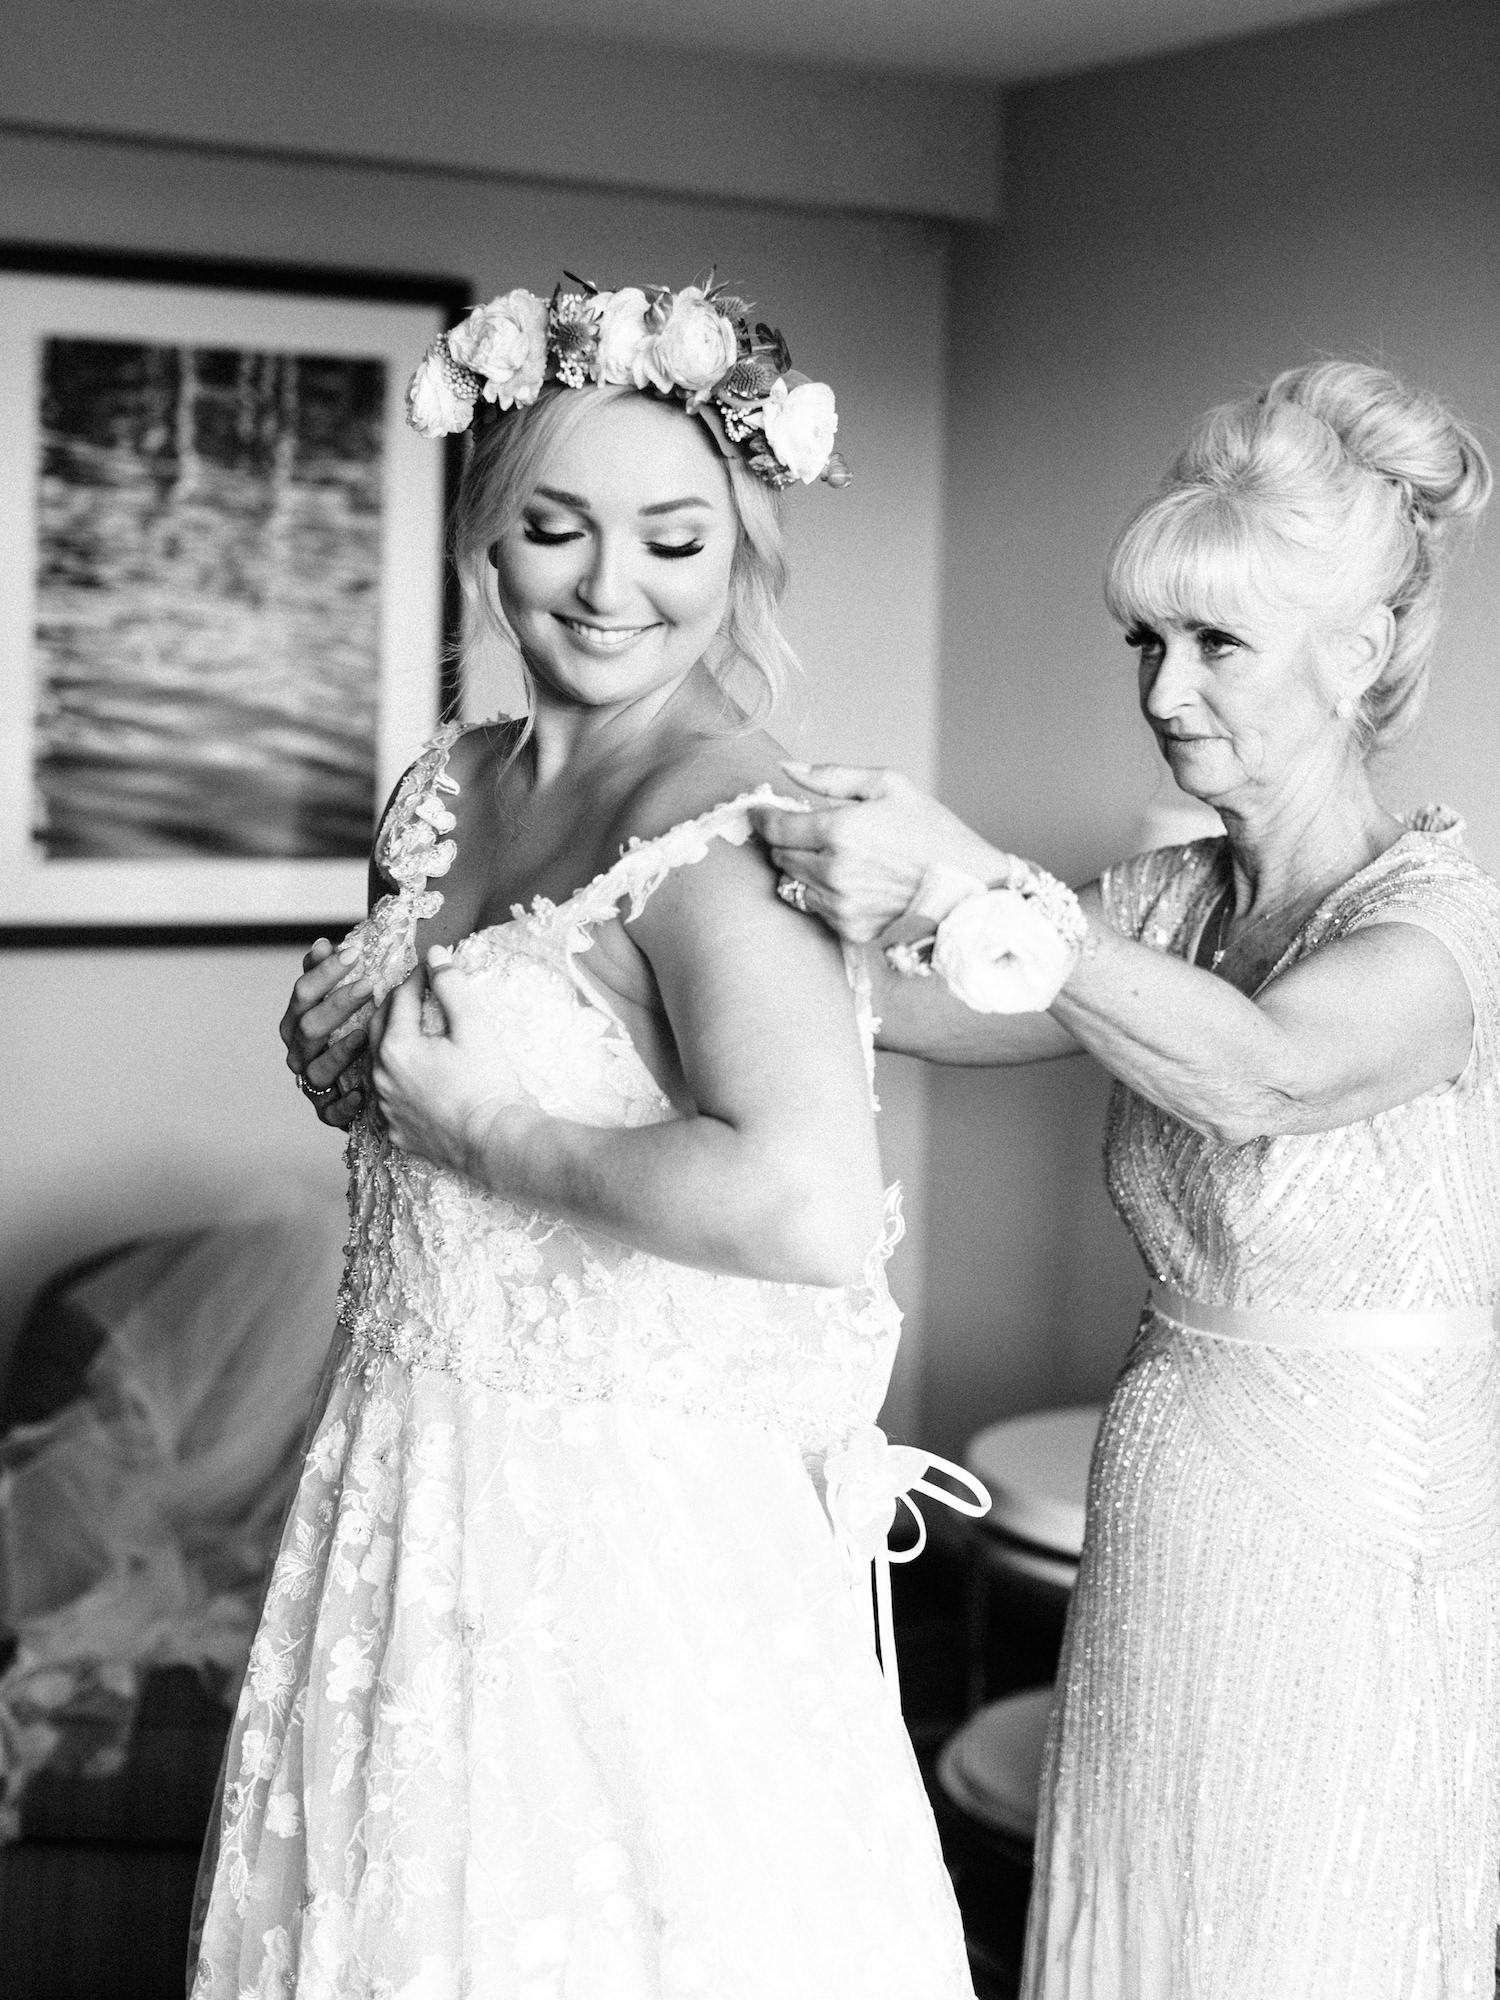 Dustan & Melanie - Pre Ceremony - Jake & Katie Photography_216.jpg